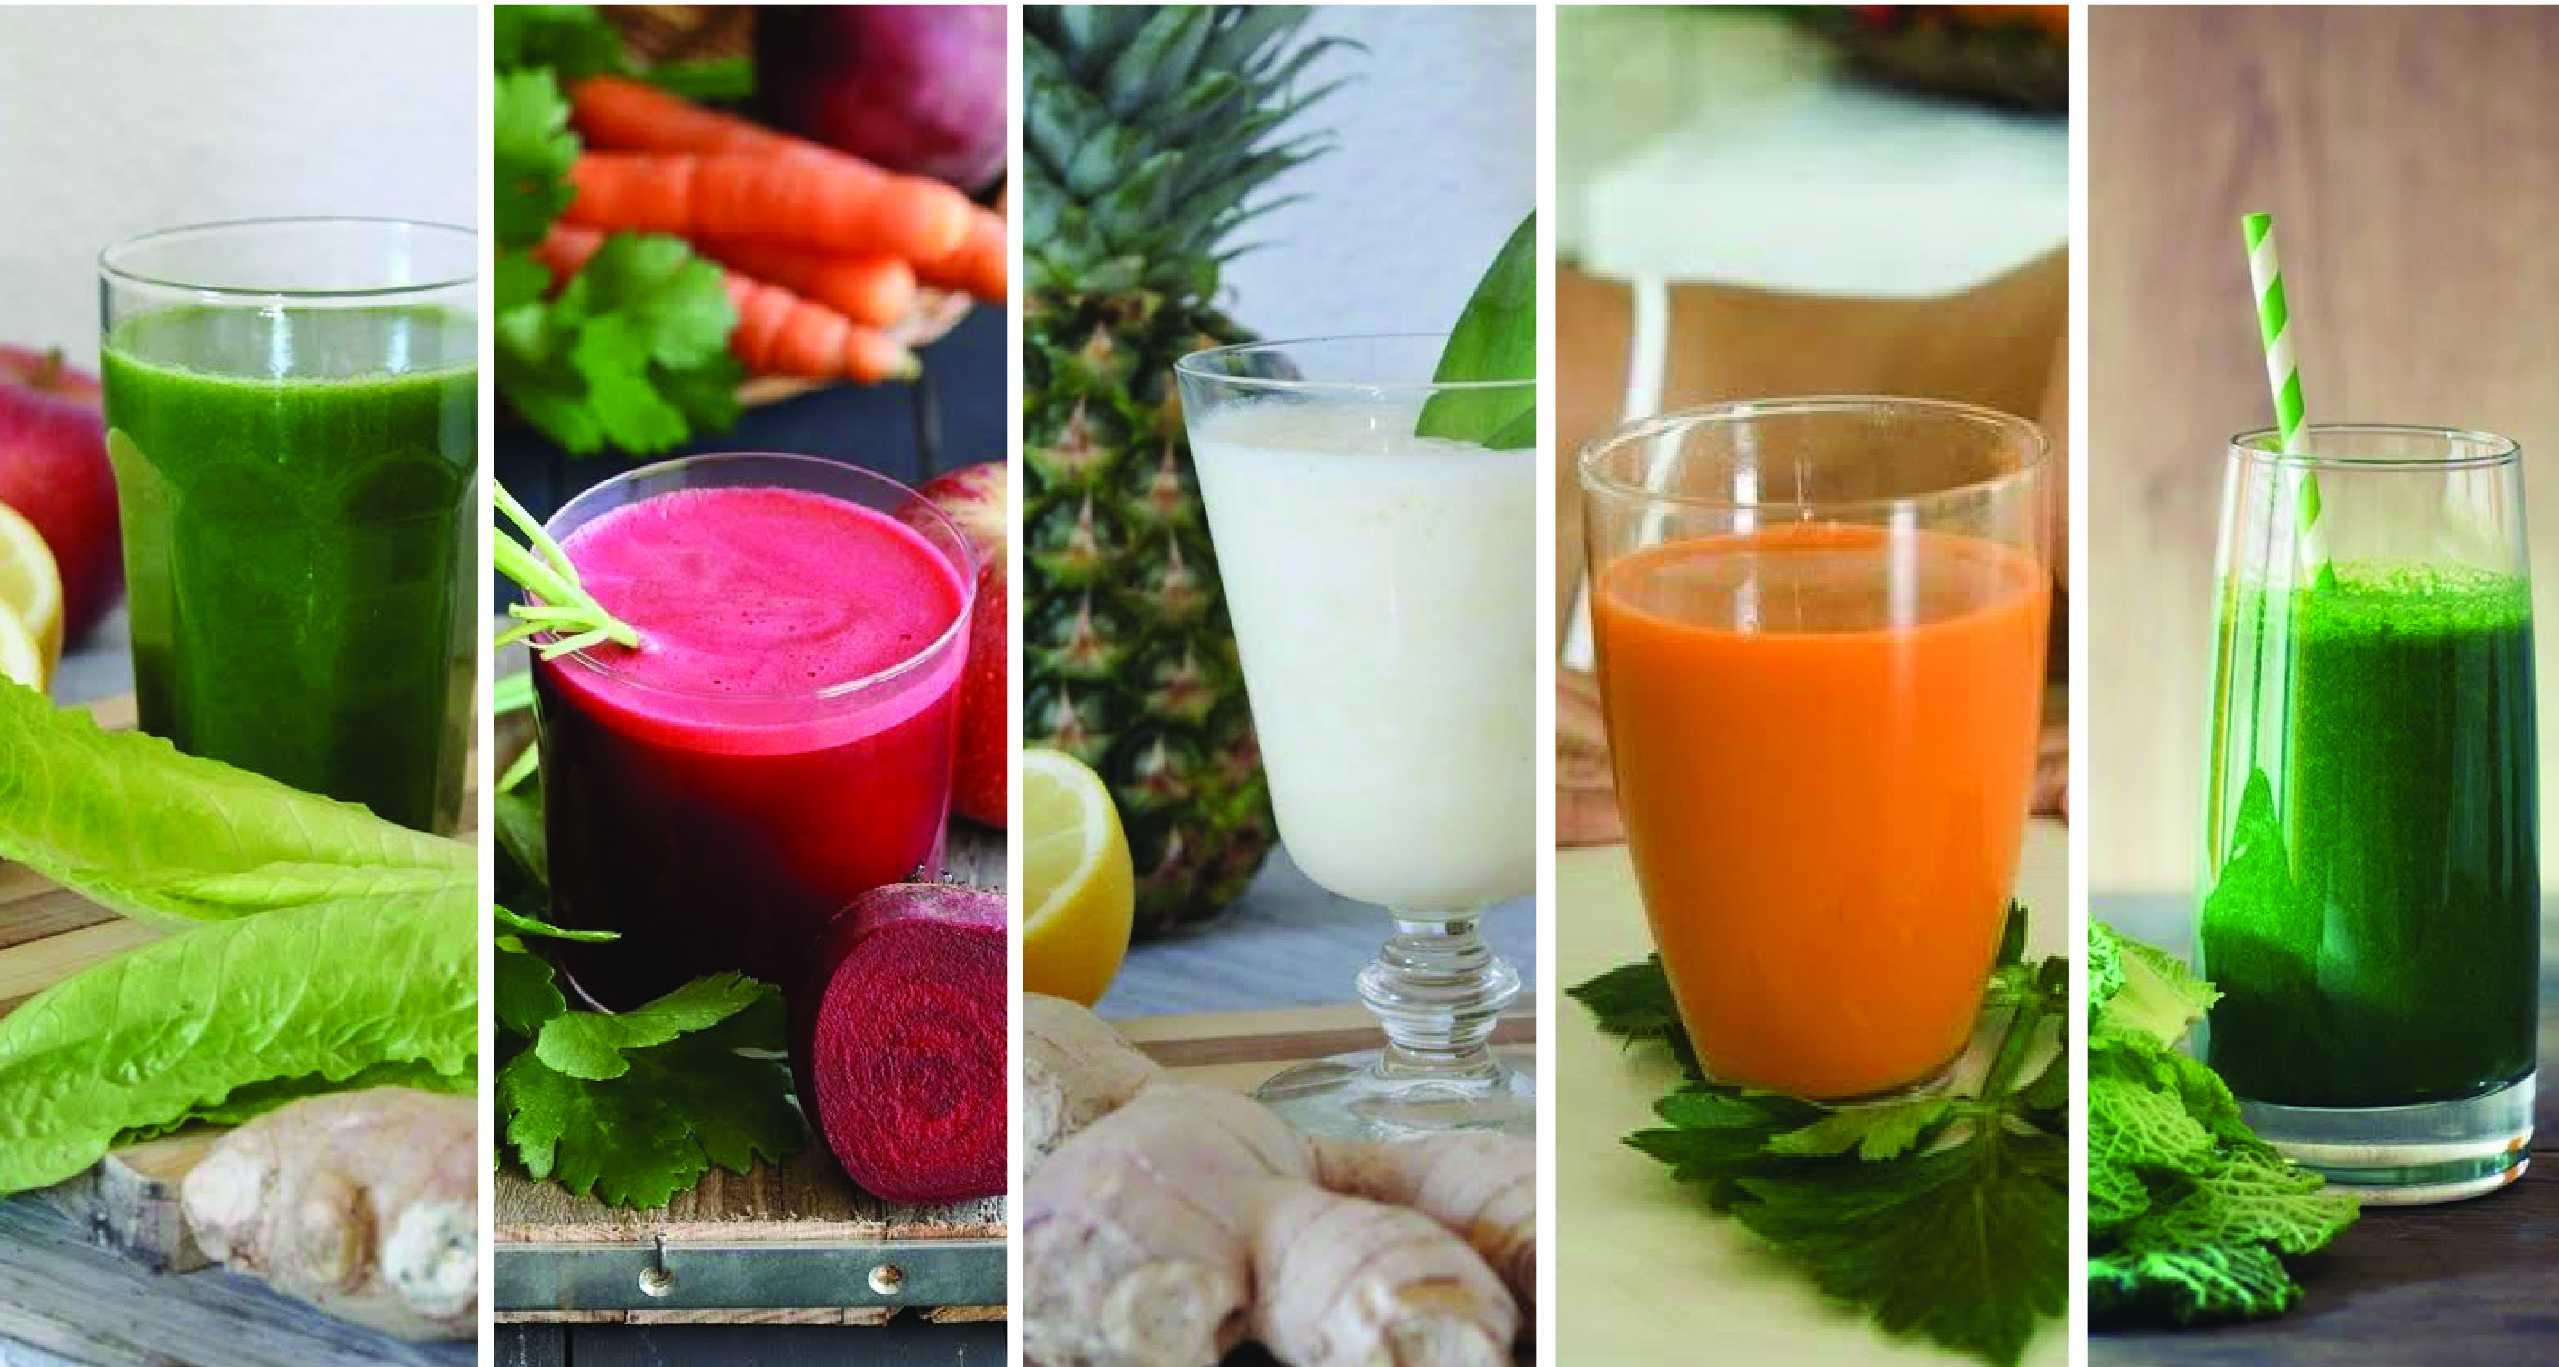 Dieta depurativa para higado y rinones